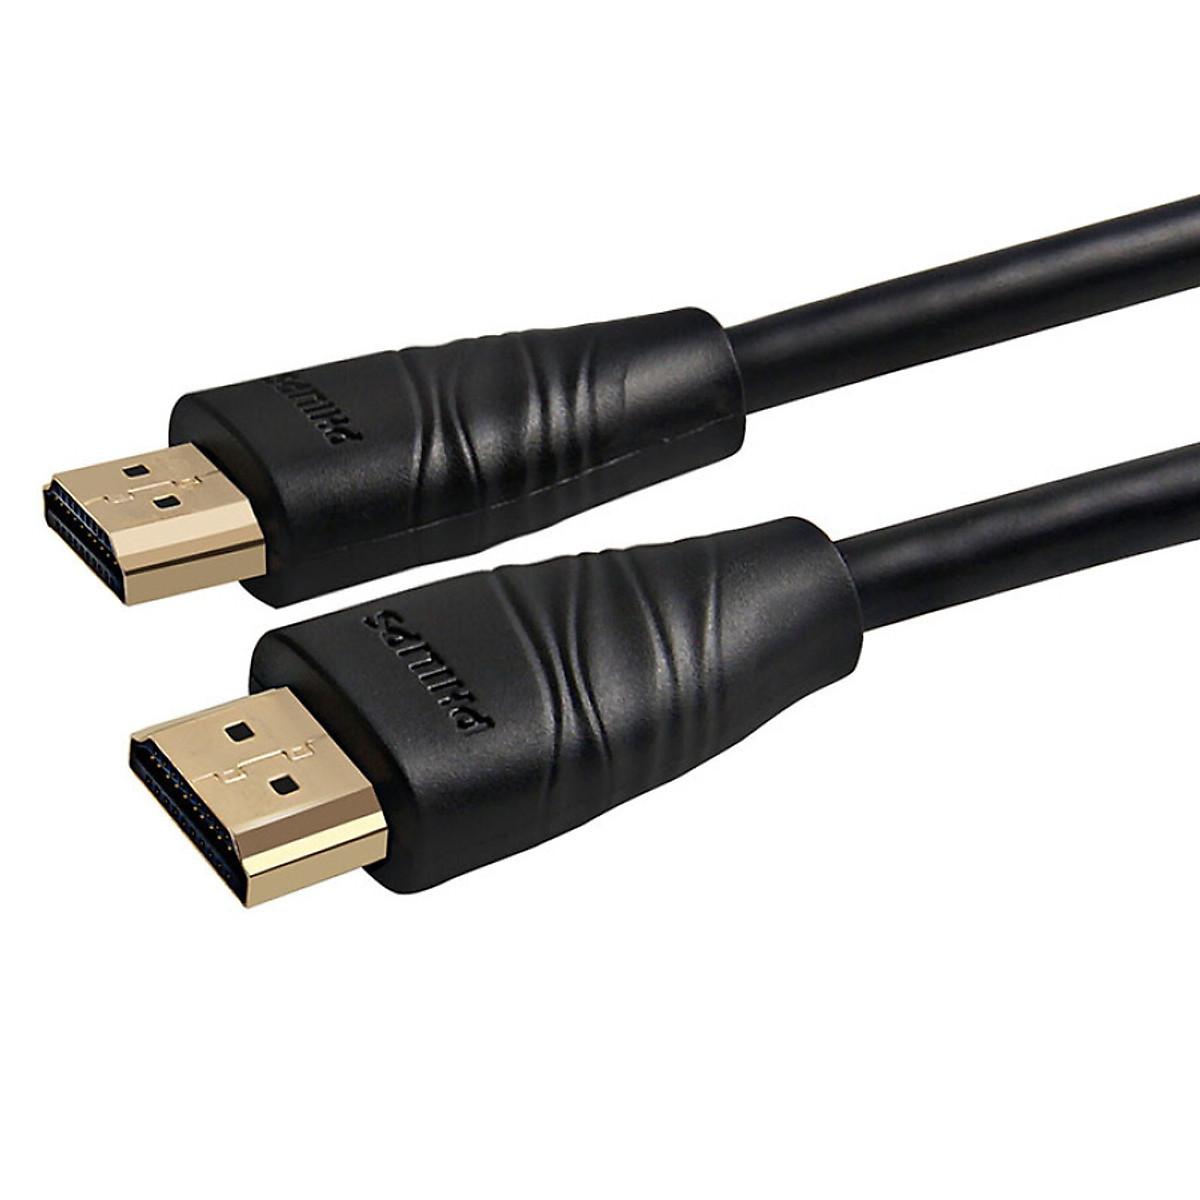 Dây Cáp 4K HDMI PHILIPS 3m SWL6118E / 93 7